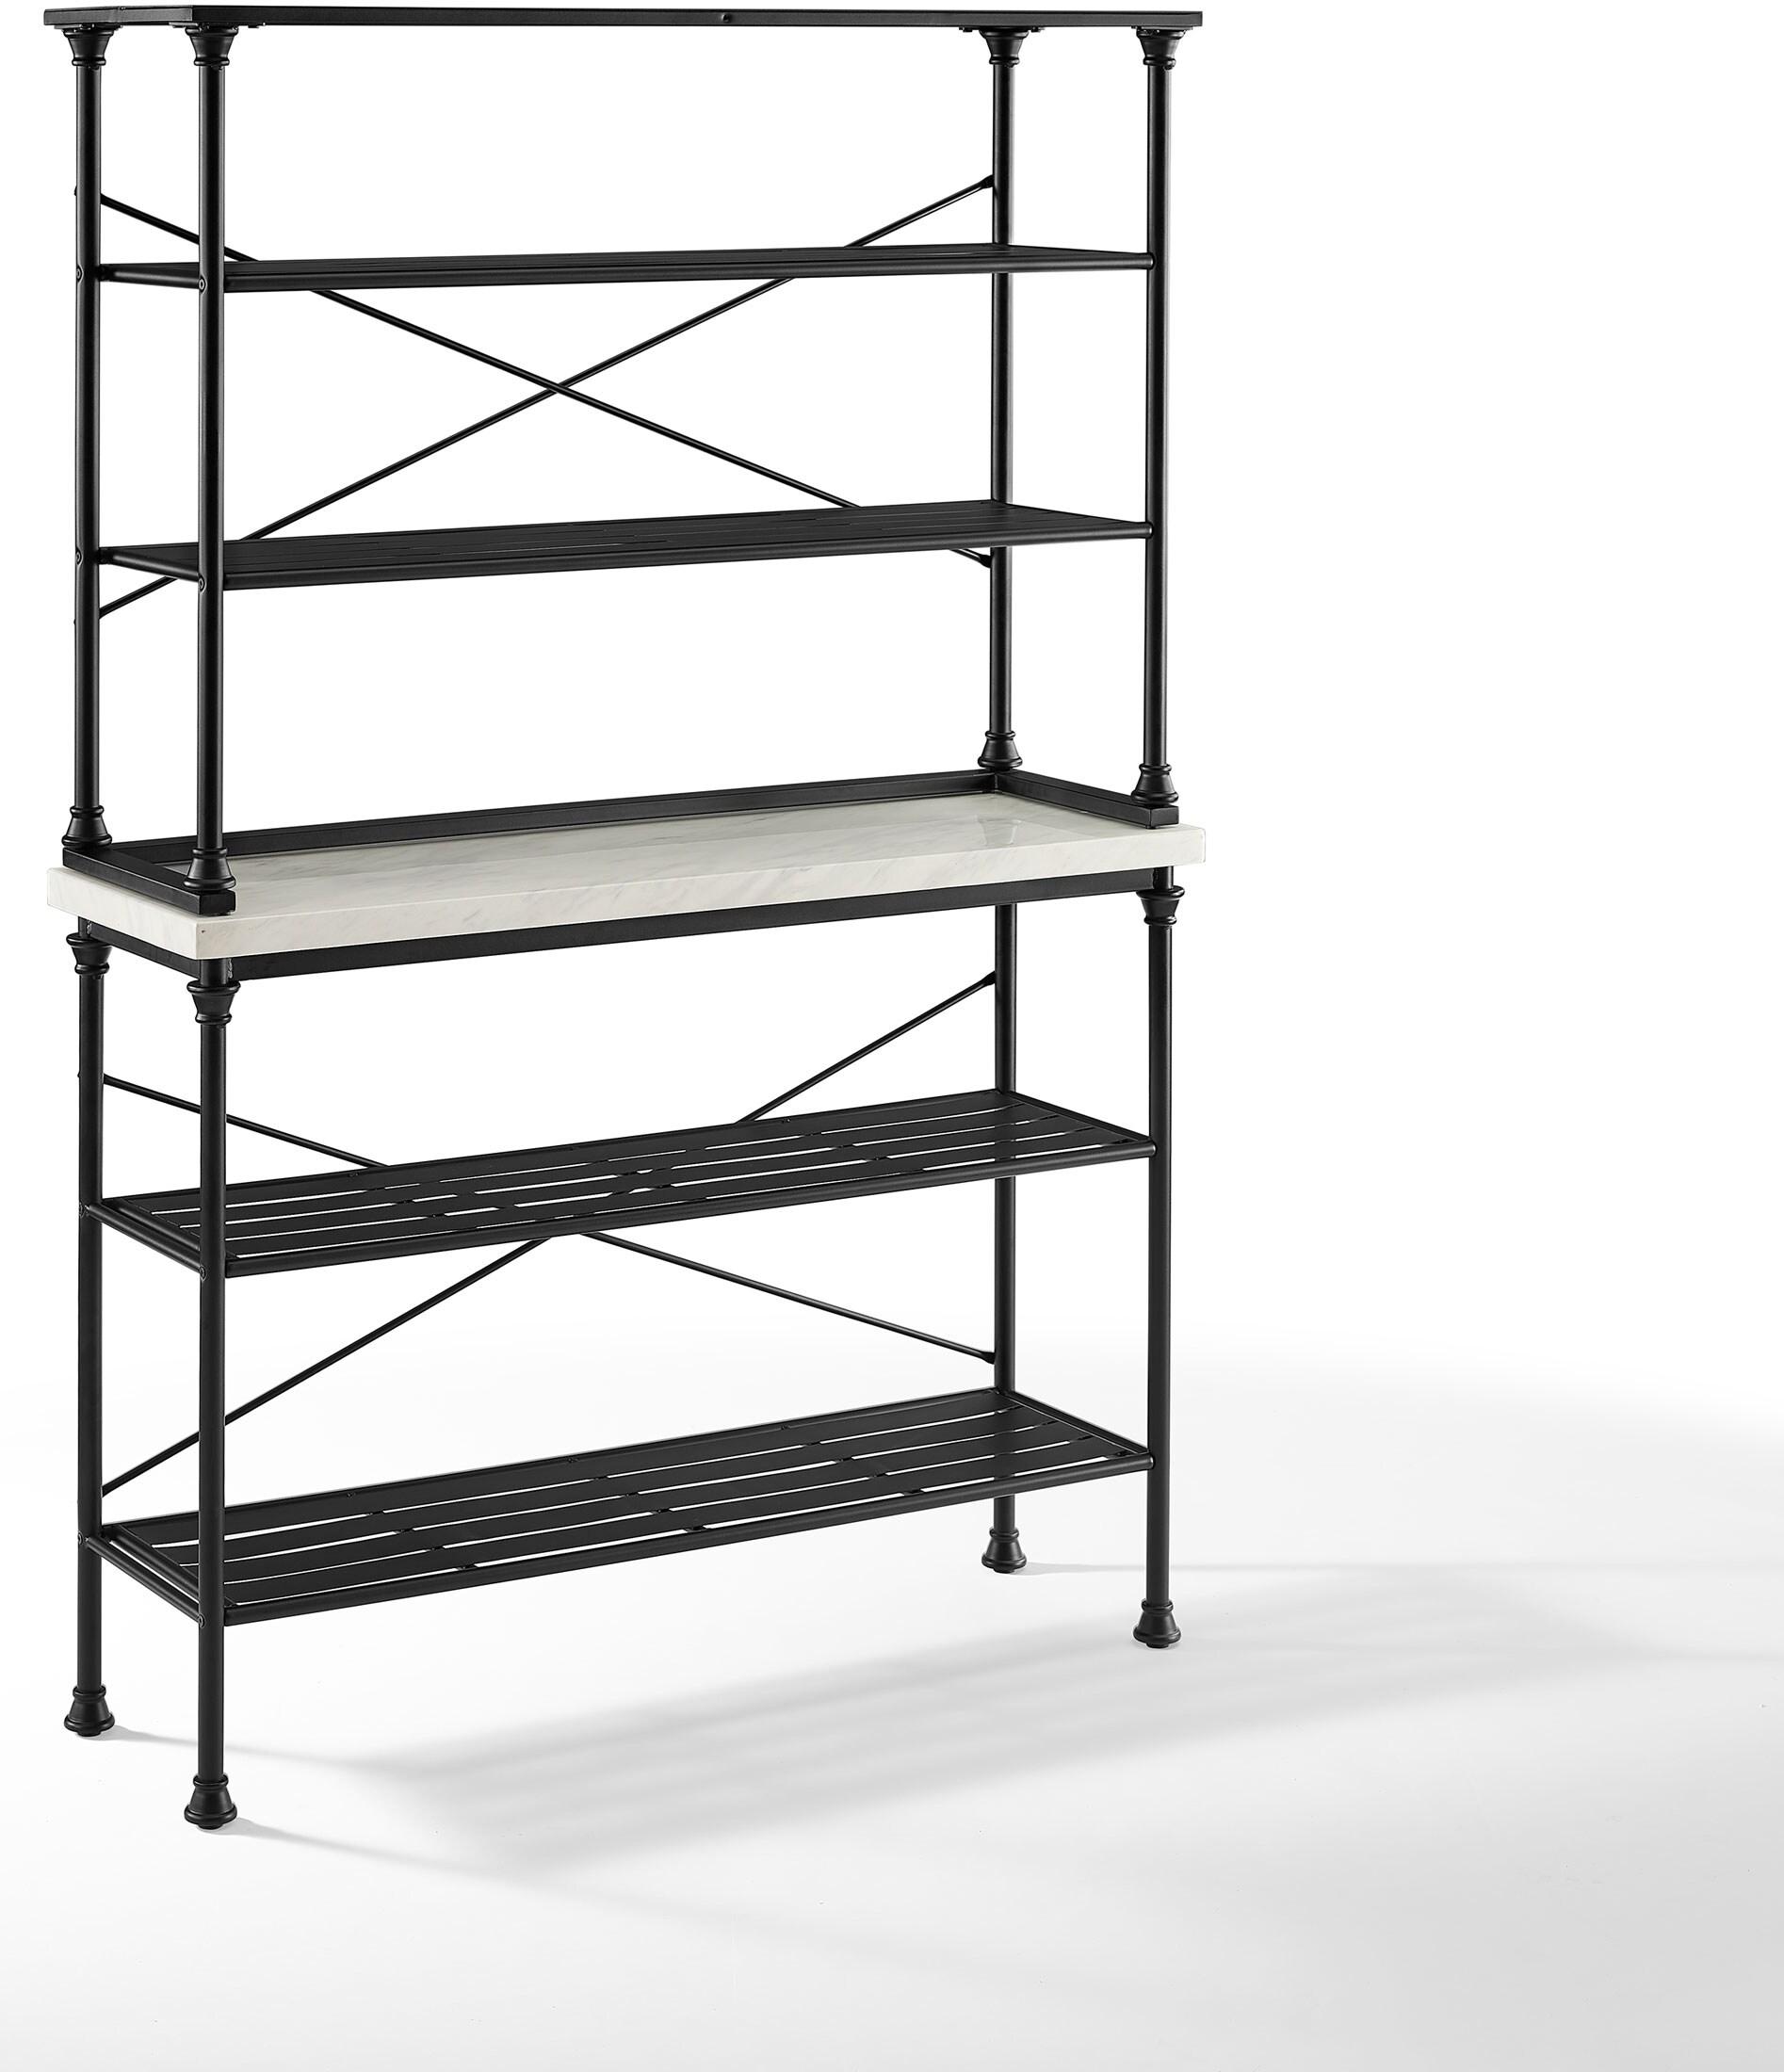 Dining Room Furniture - Mila Baker's Rack